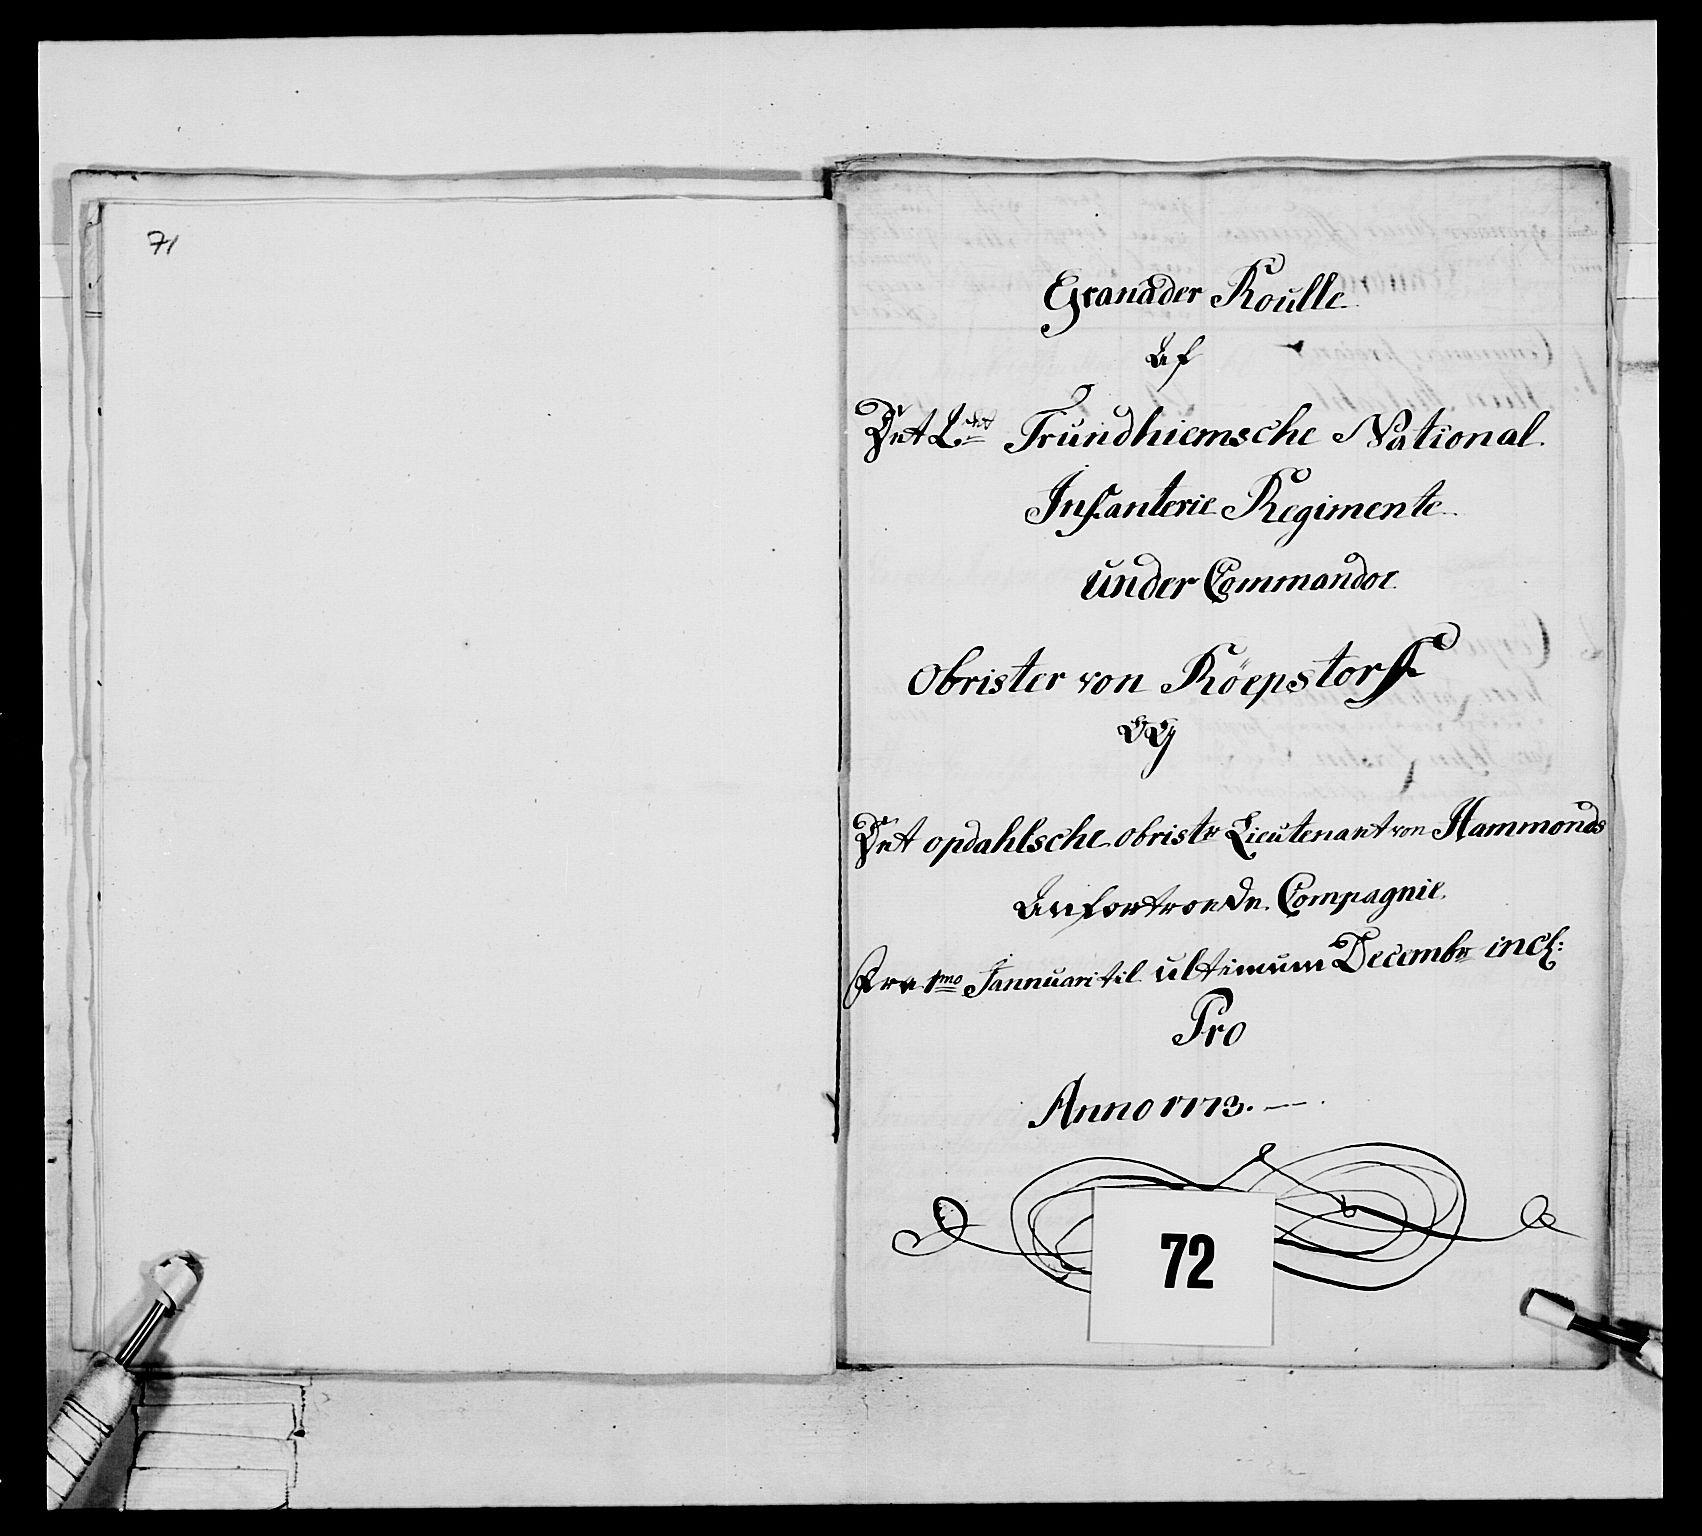 RA, Generalitets- og kommissariatskollegiet, Det kongelige norske kommissariatskollegium, E/Eh/L0076: 2. Trondheimske nasjonale infanteriregiment, 1766-1773, p. 315